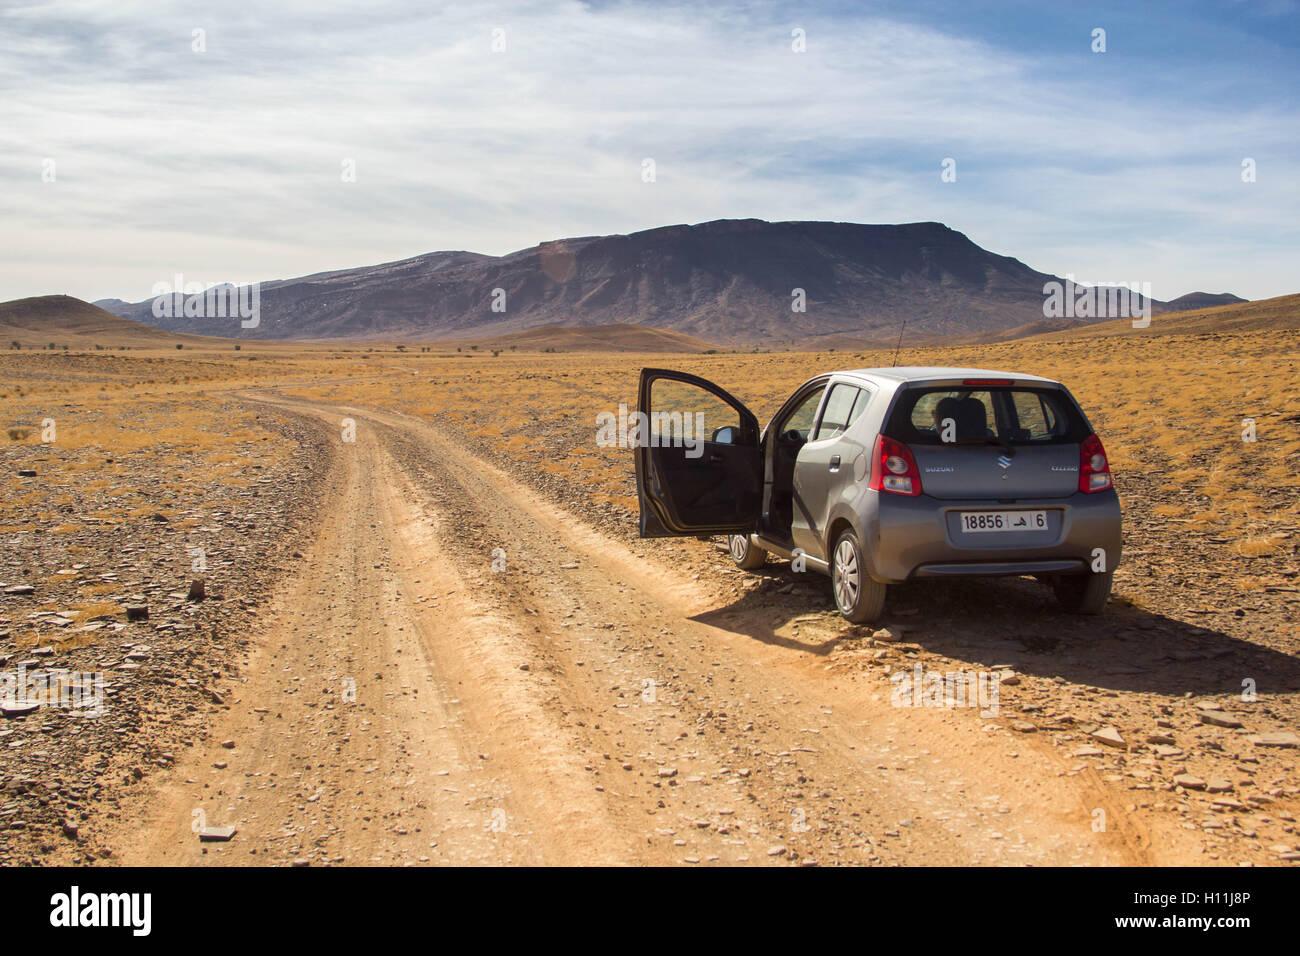 Car in stony desert, Morocco, North Africa - Stock Image